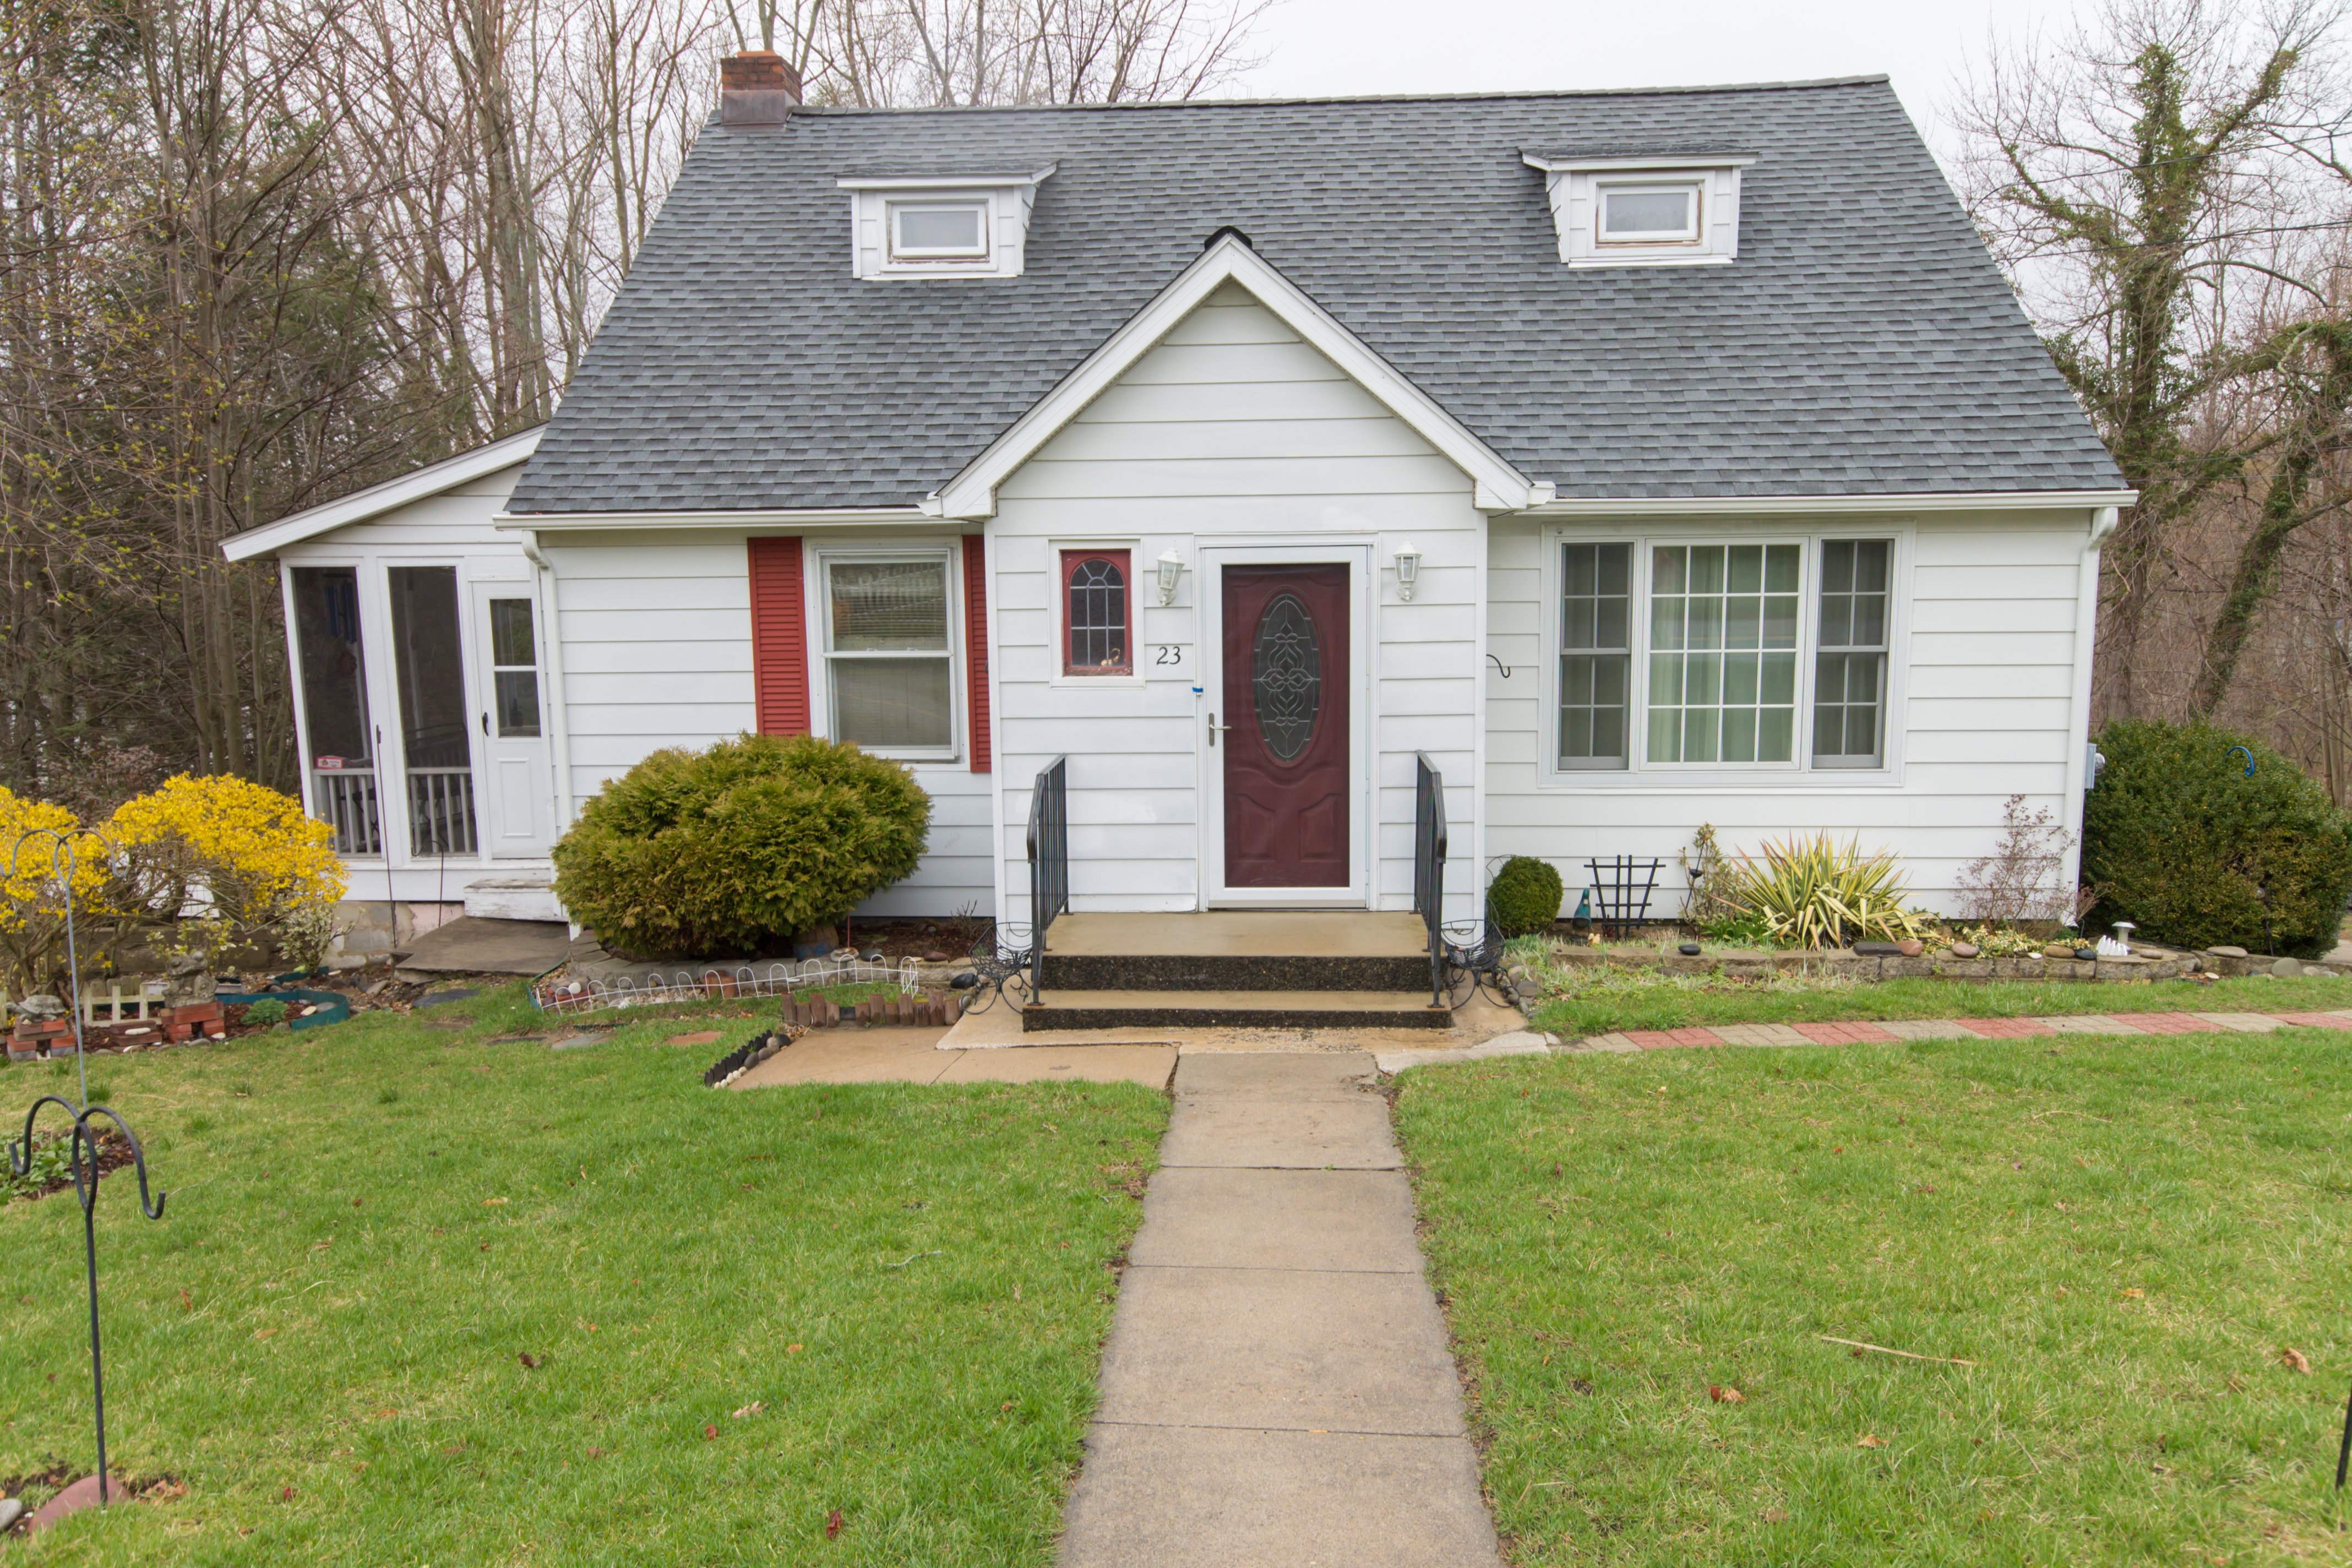 Single Family Home for Sale at Beautiful Village Cape 23 Virginia Avenue Danbury, Connecticut, 06810 United States